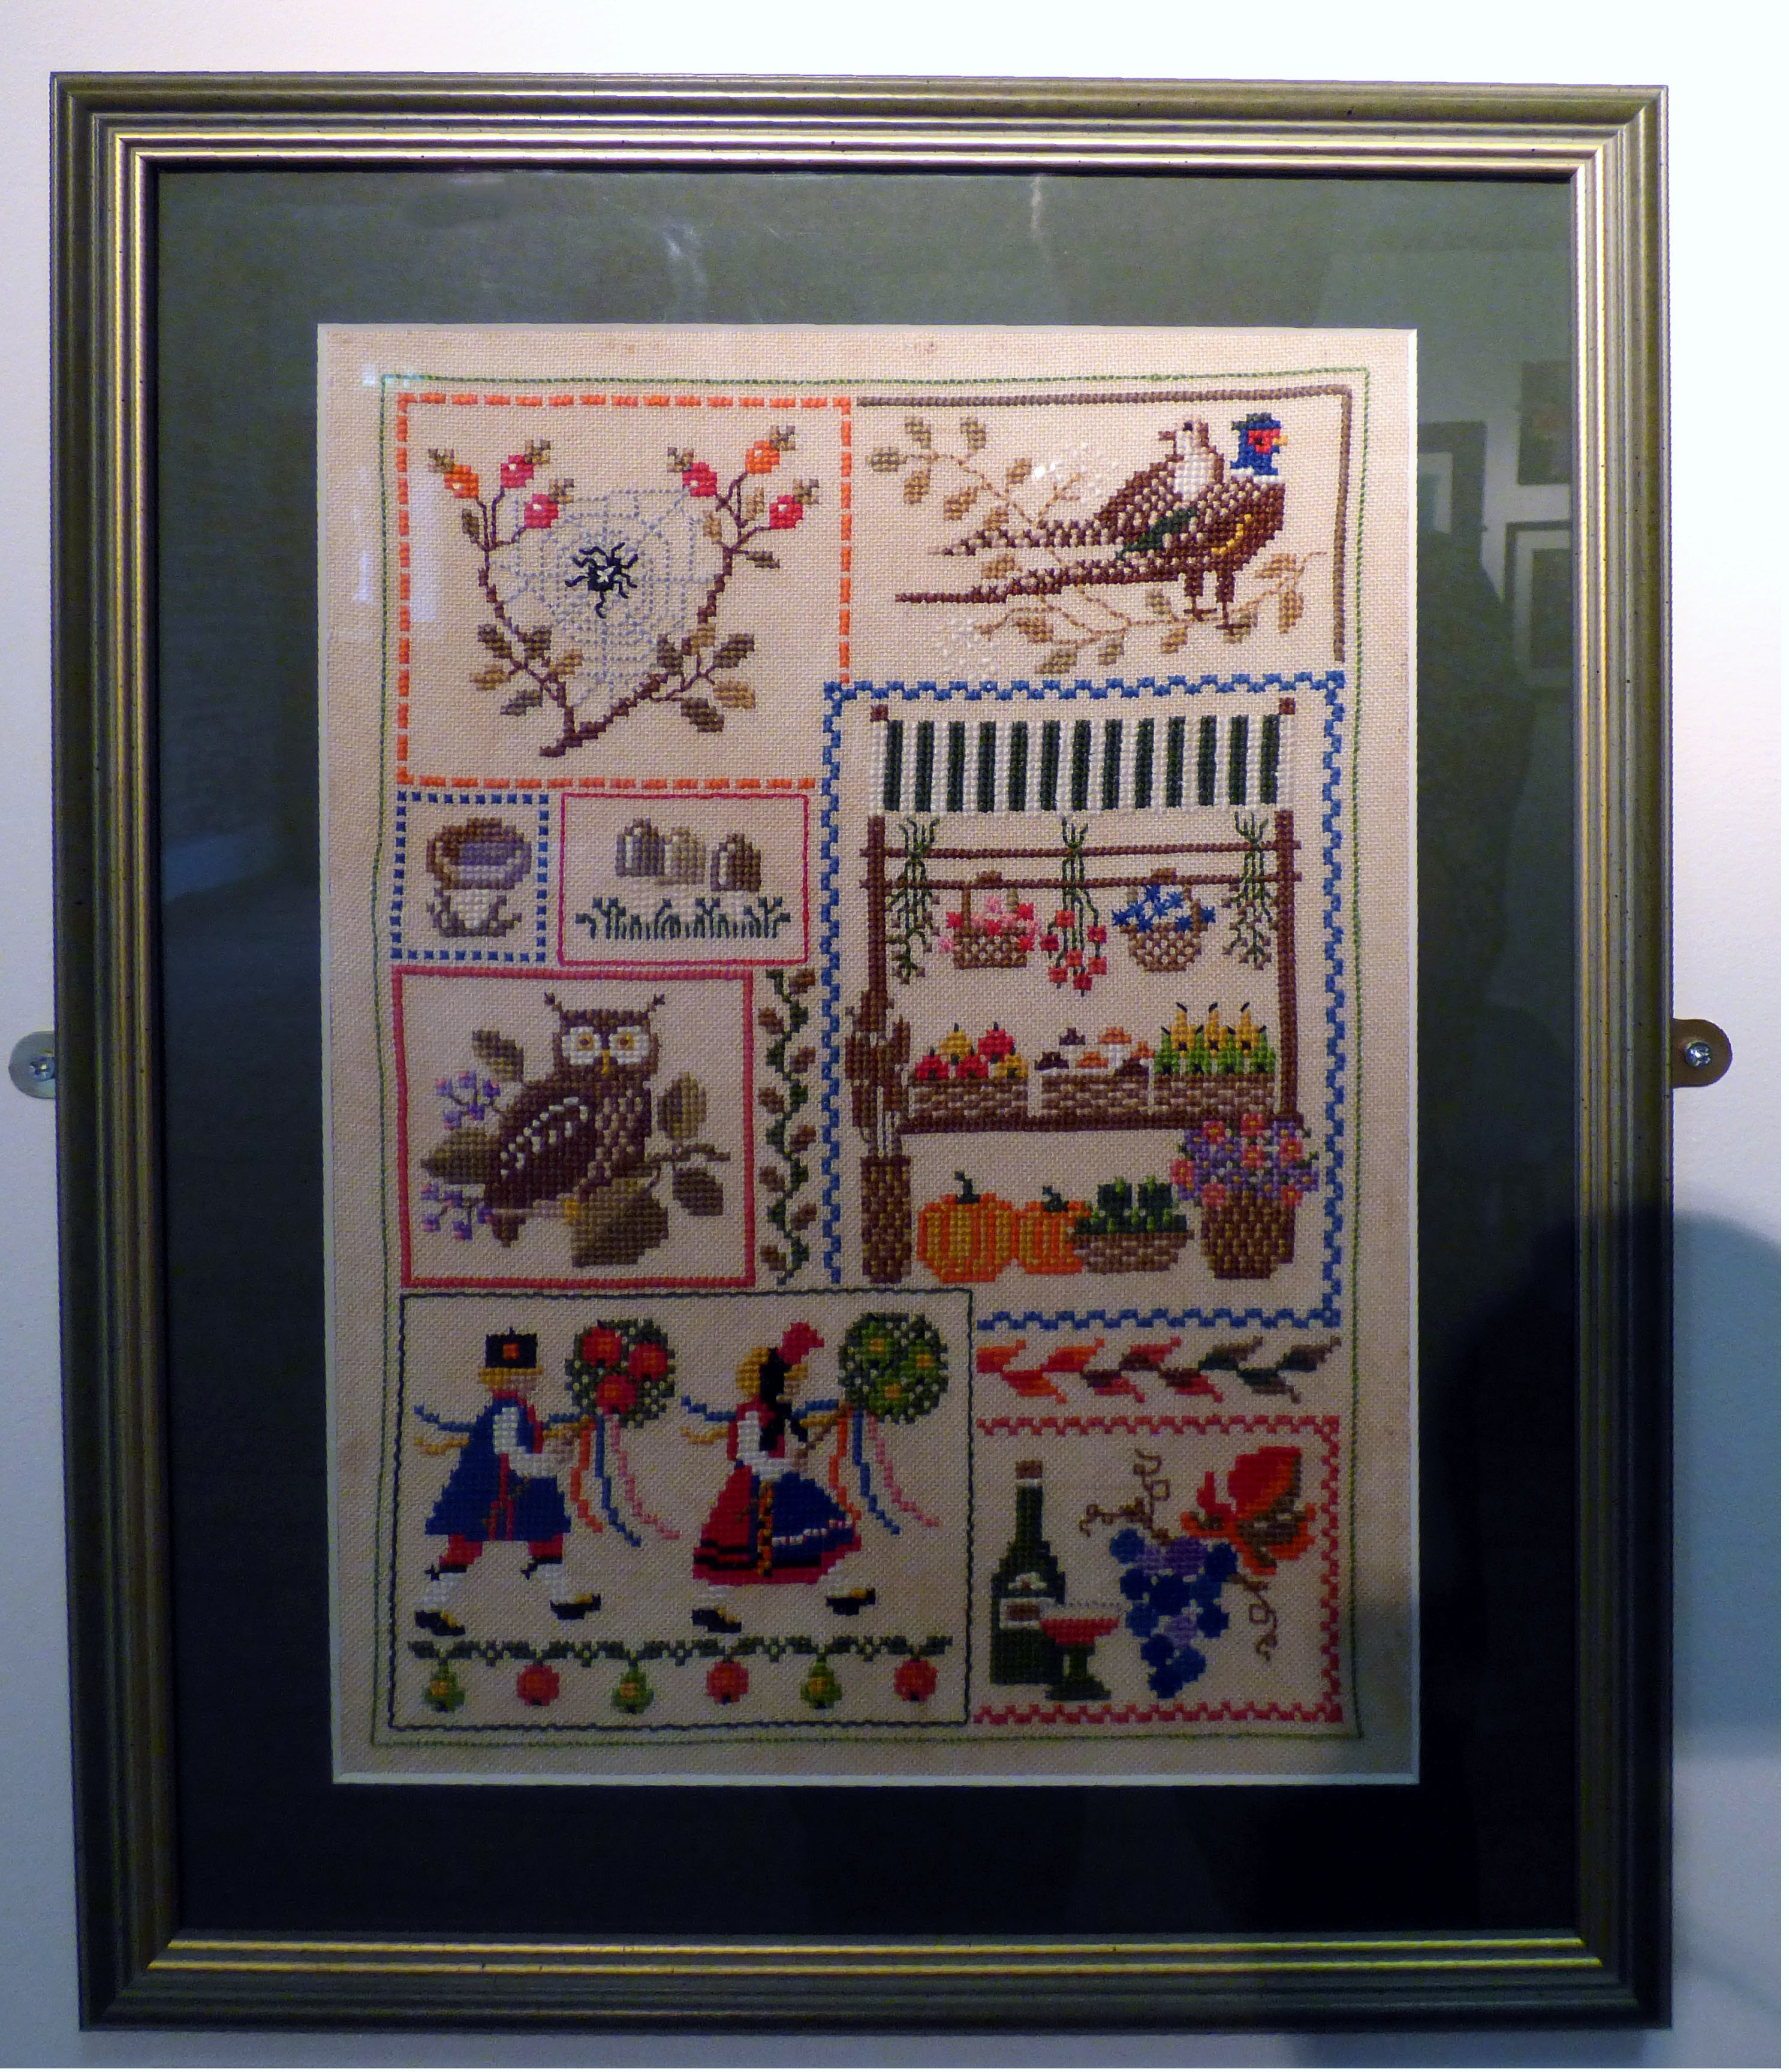 AUTUMN DAYS by patricia Caldwell, cross stitch